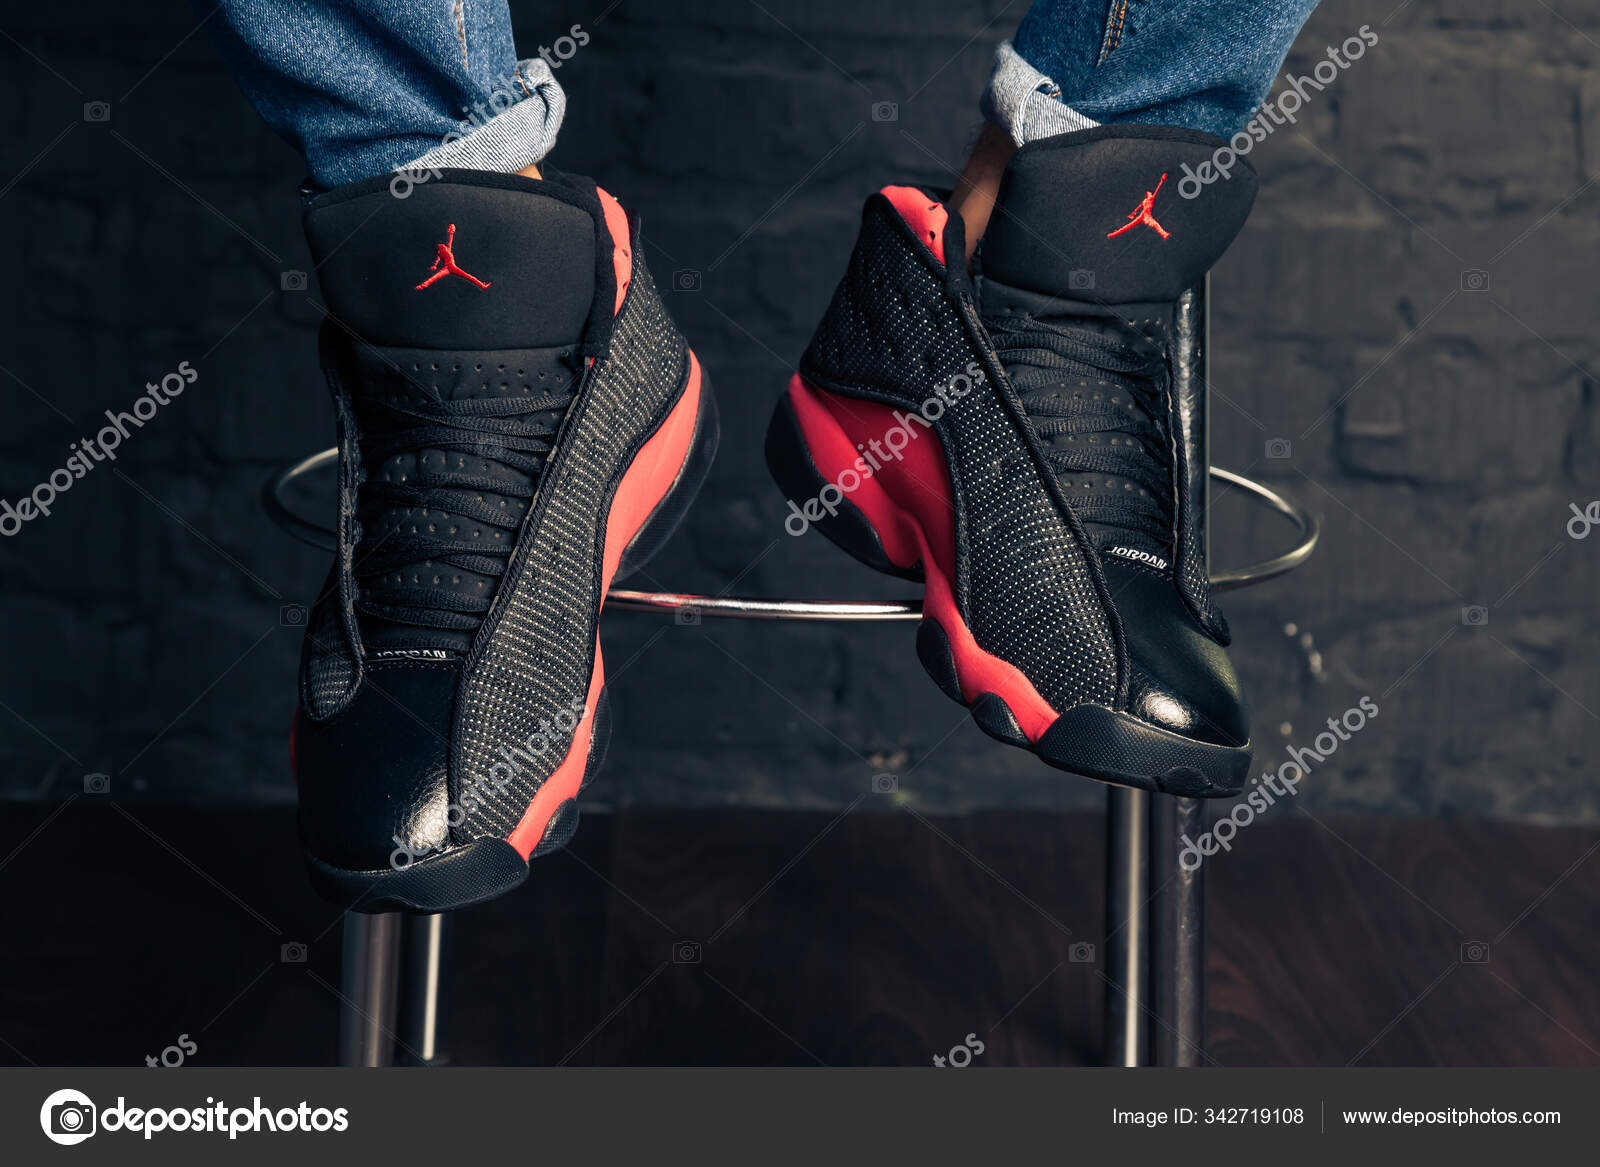 New Beautiful Colorful Nice Jordan Air Max Running Shoes Sneakers Stock Editorial Photo C Sozon 342719108